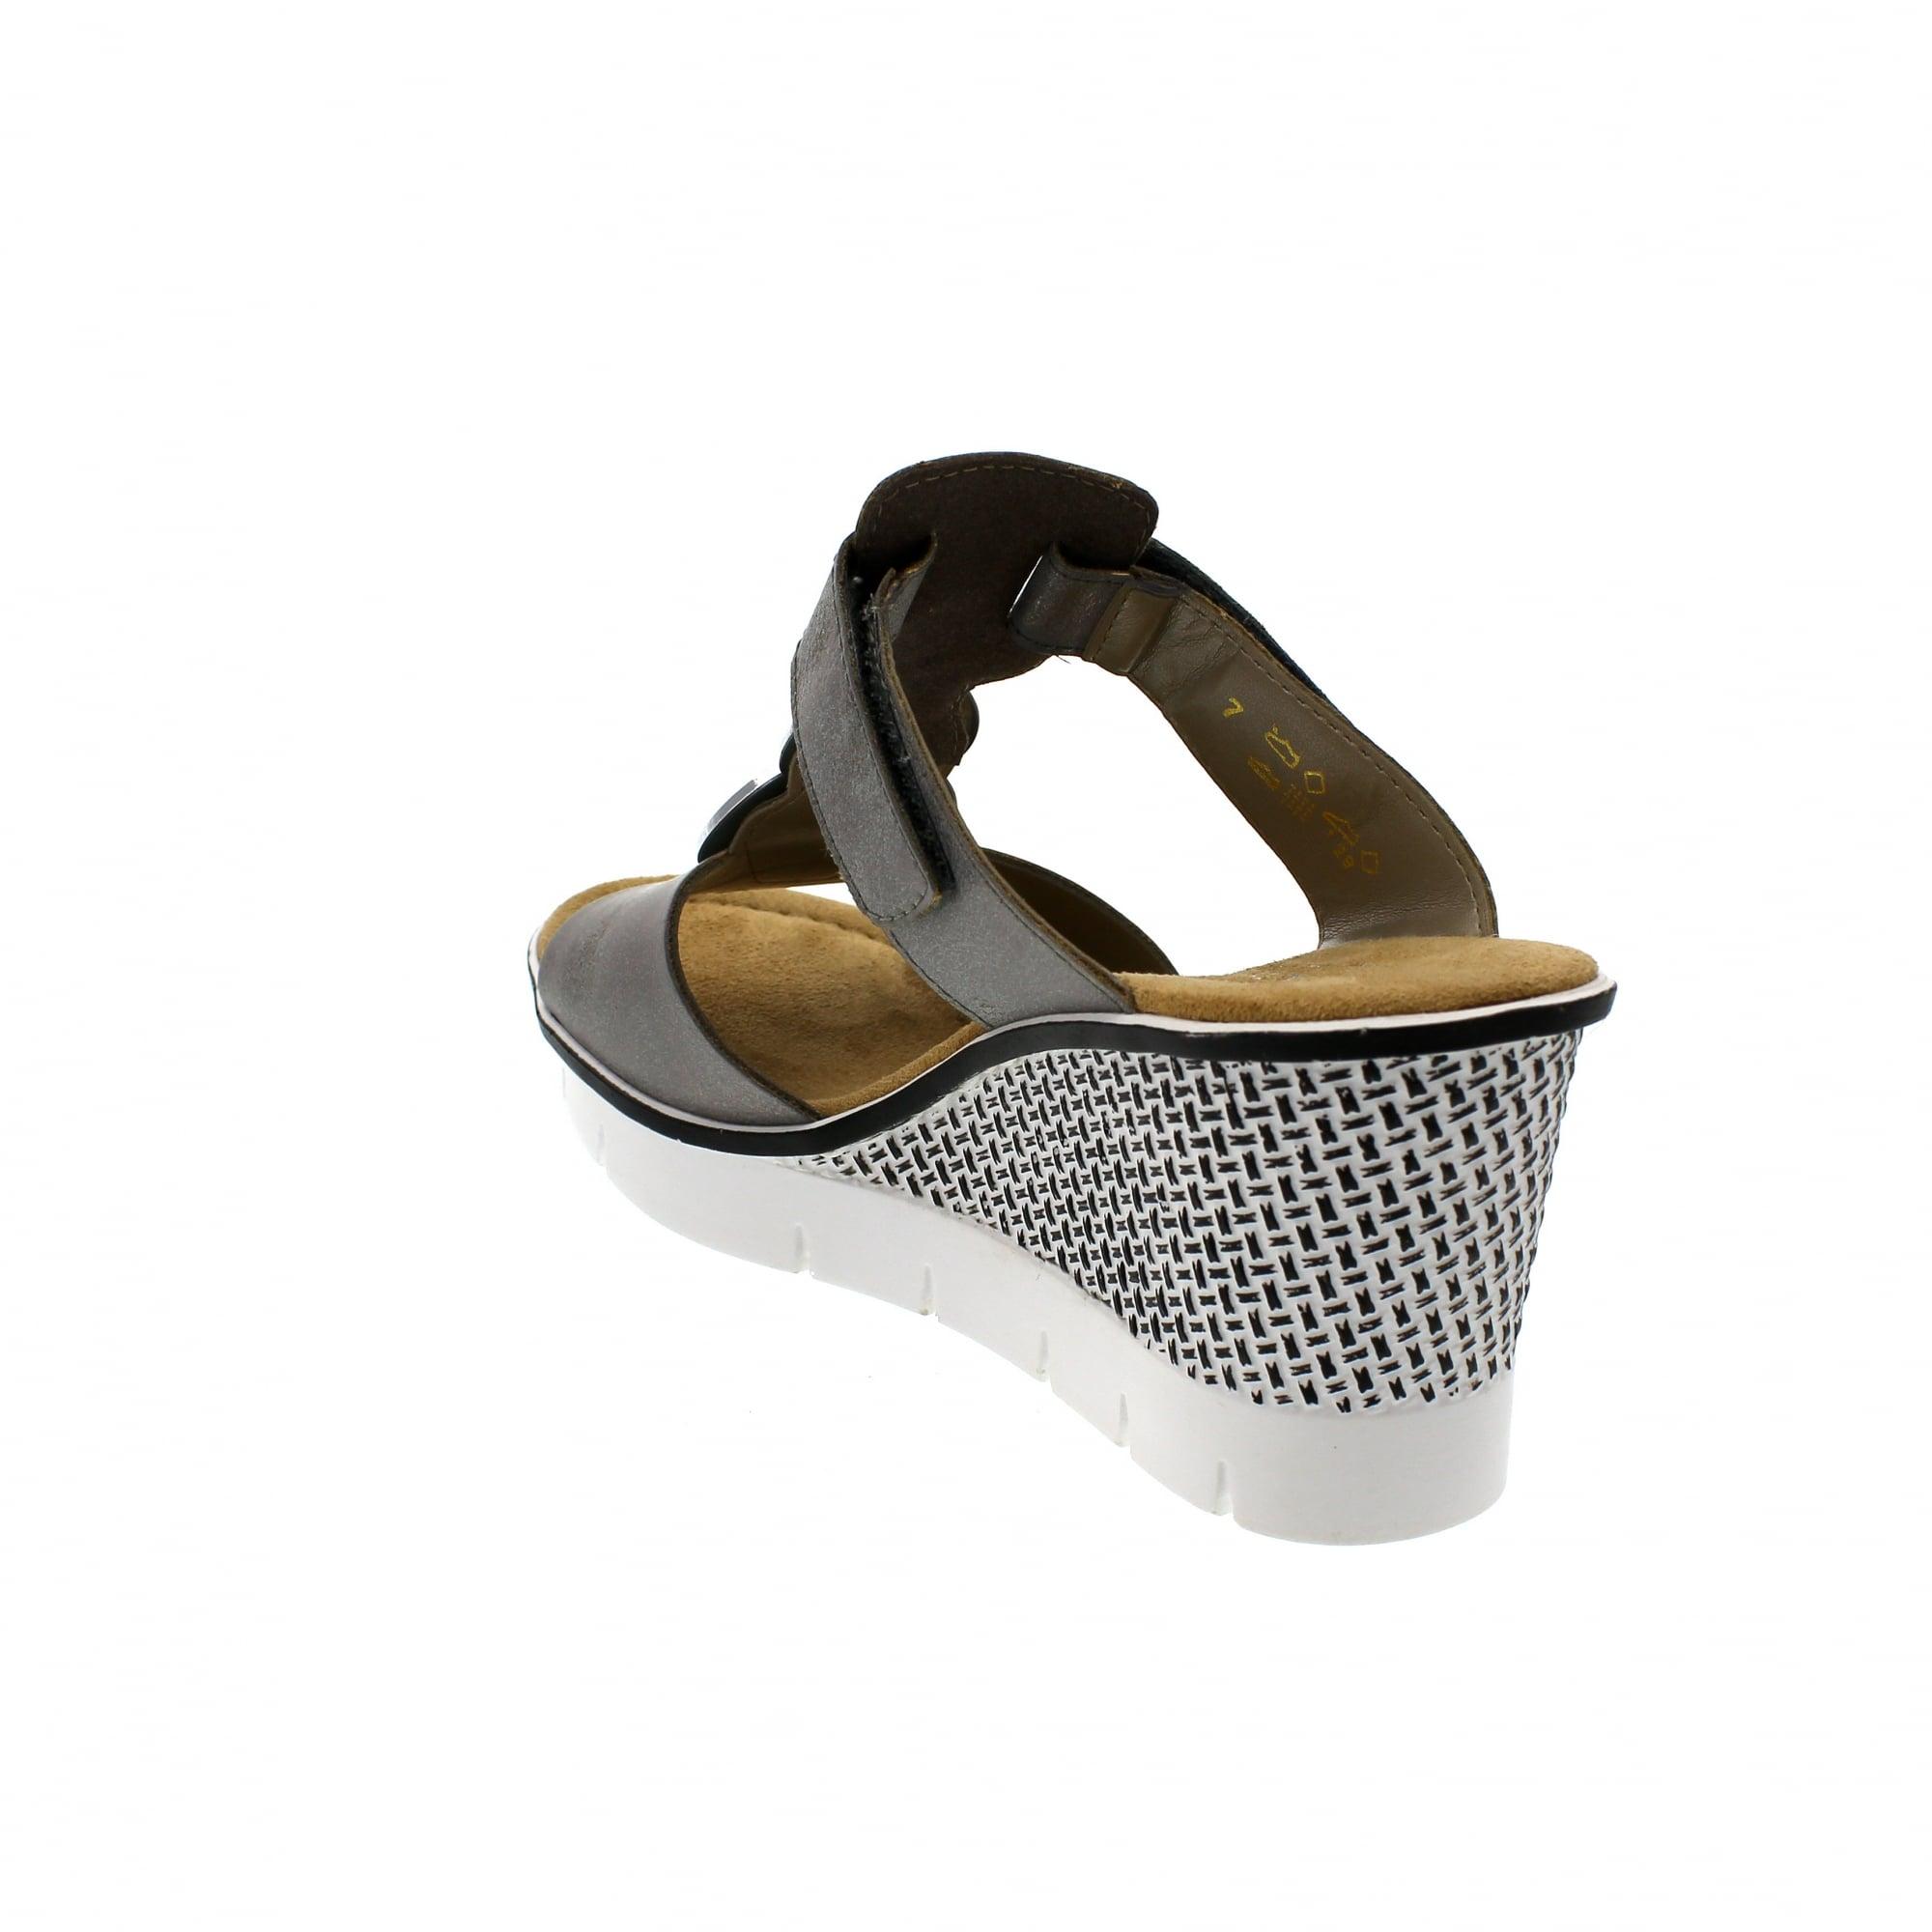 59d475bdb62 Rieker 68563-40 Pewter Denim Womens Mule Sandals